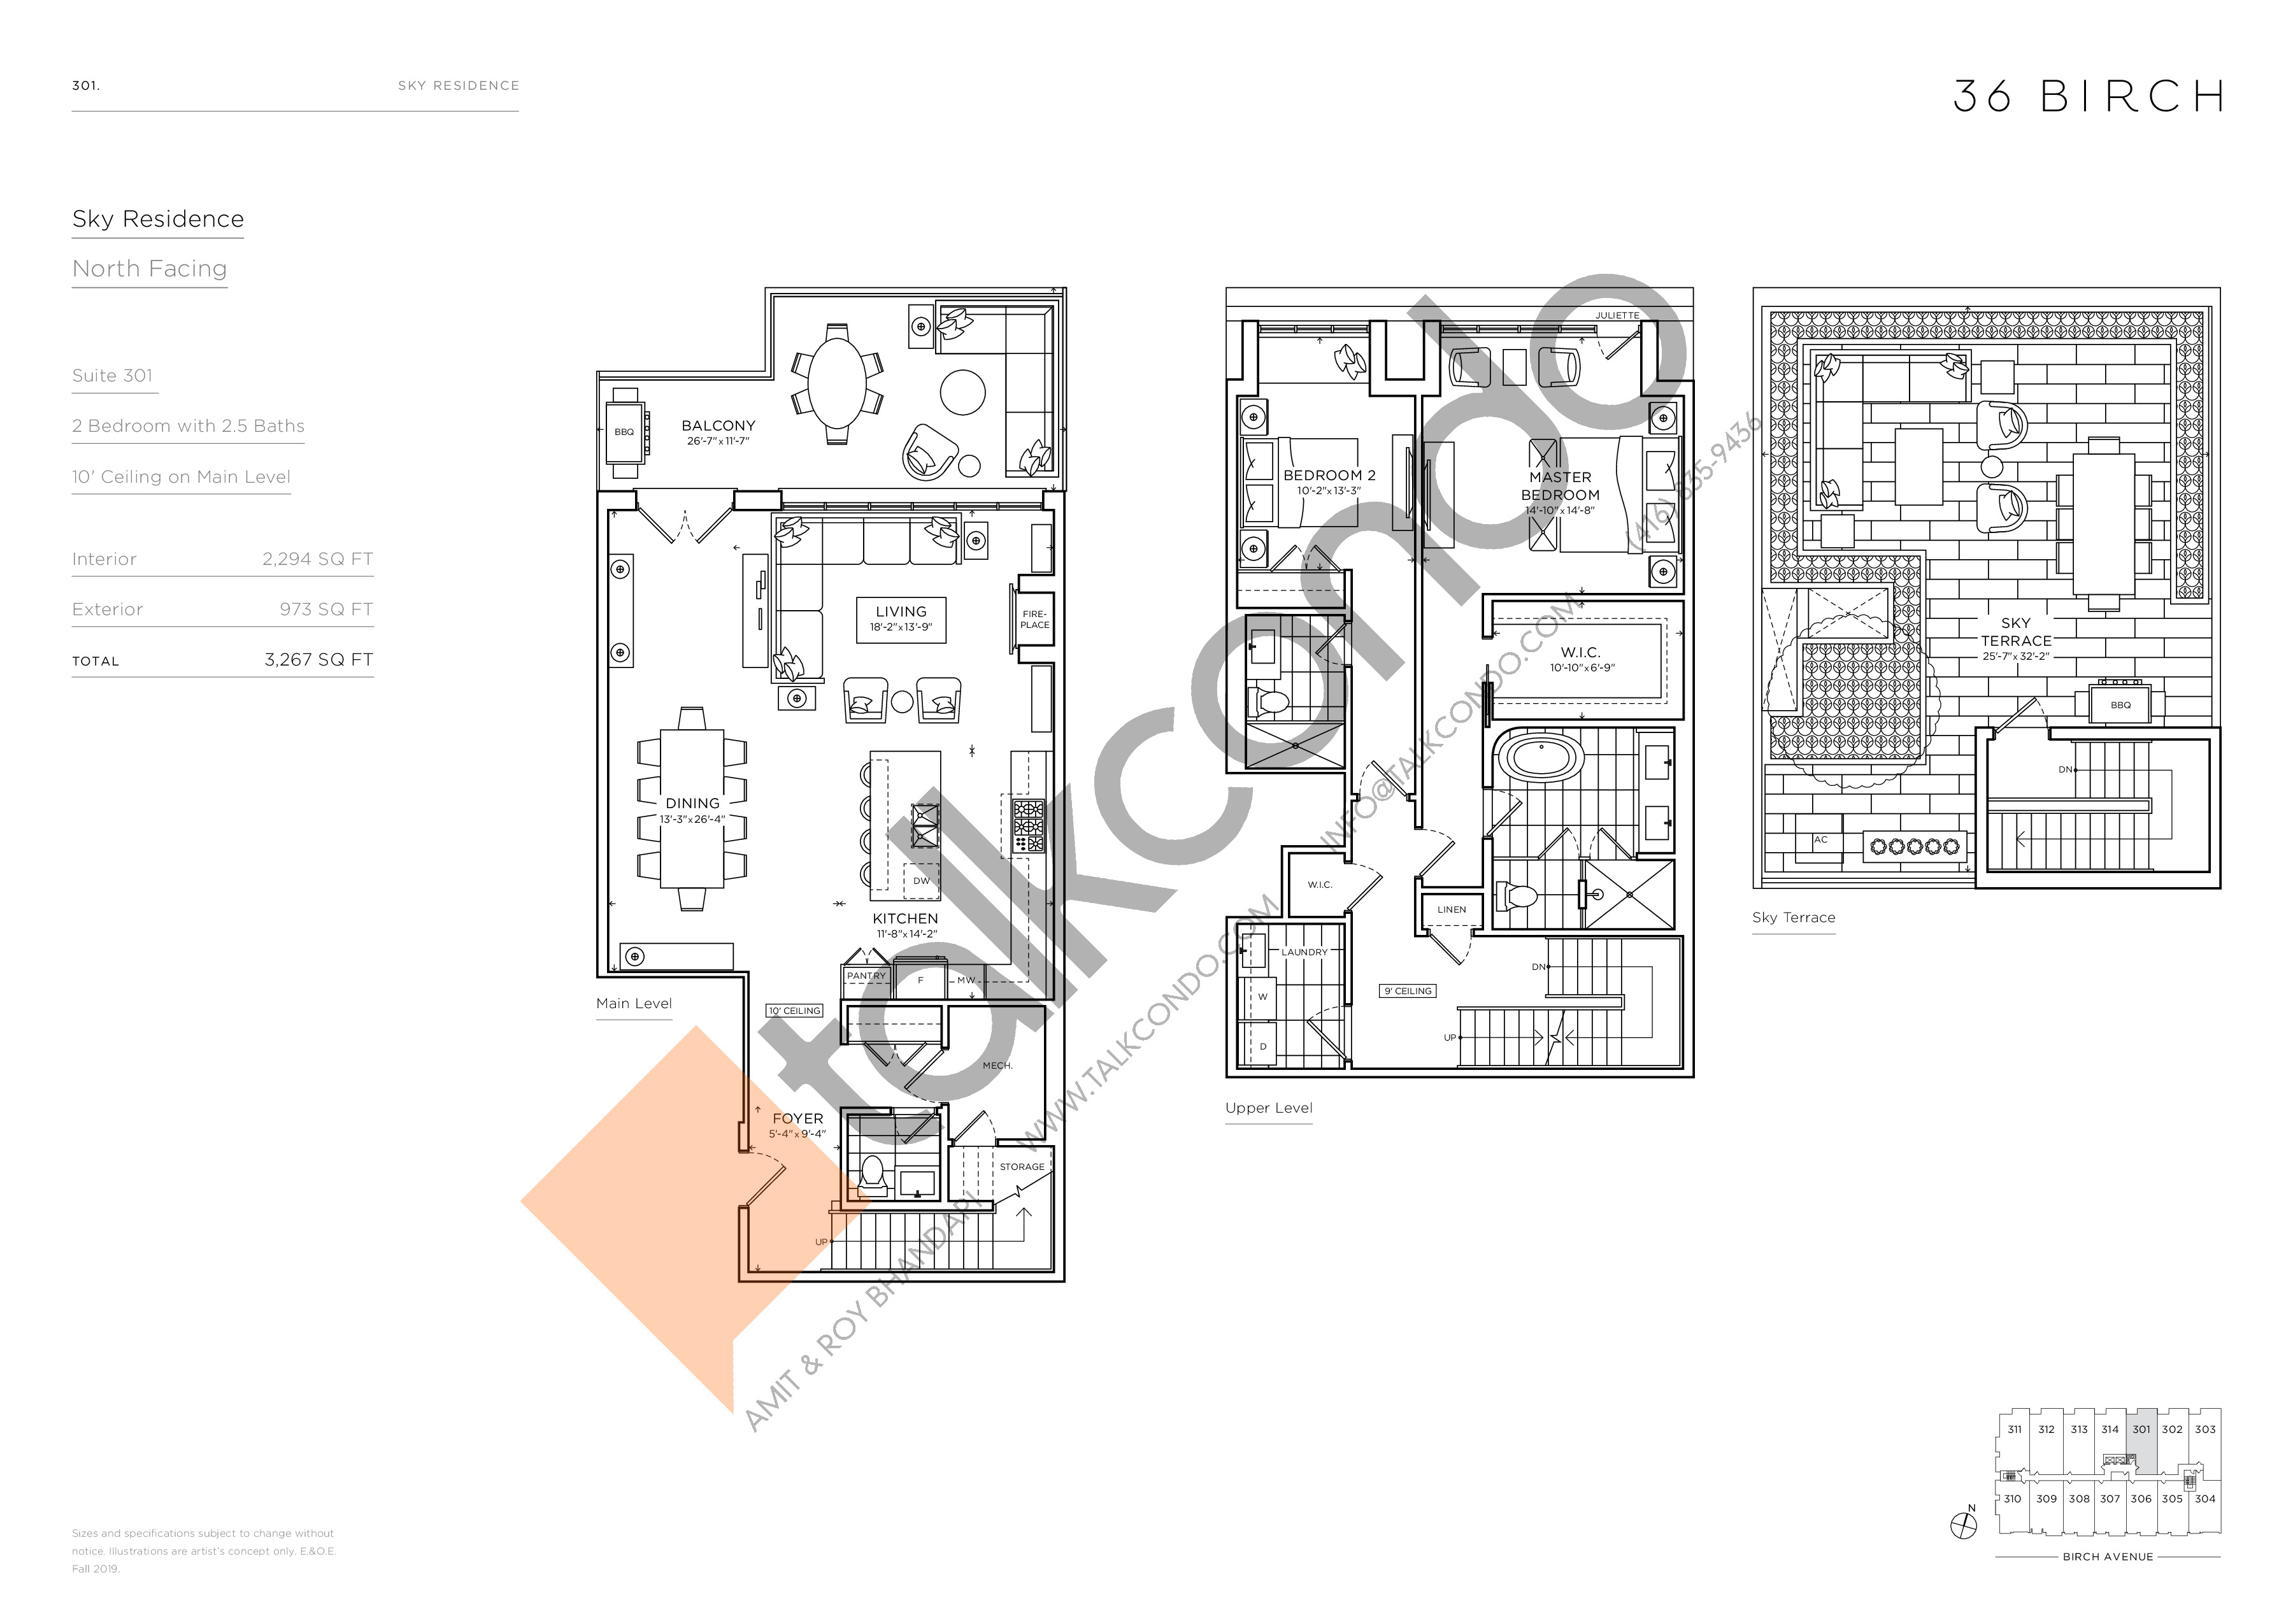 301 - Sky Residence Floor Plan at 36 Birch Avenue Condos - 2294 sq.ft